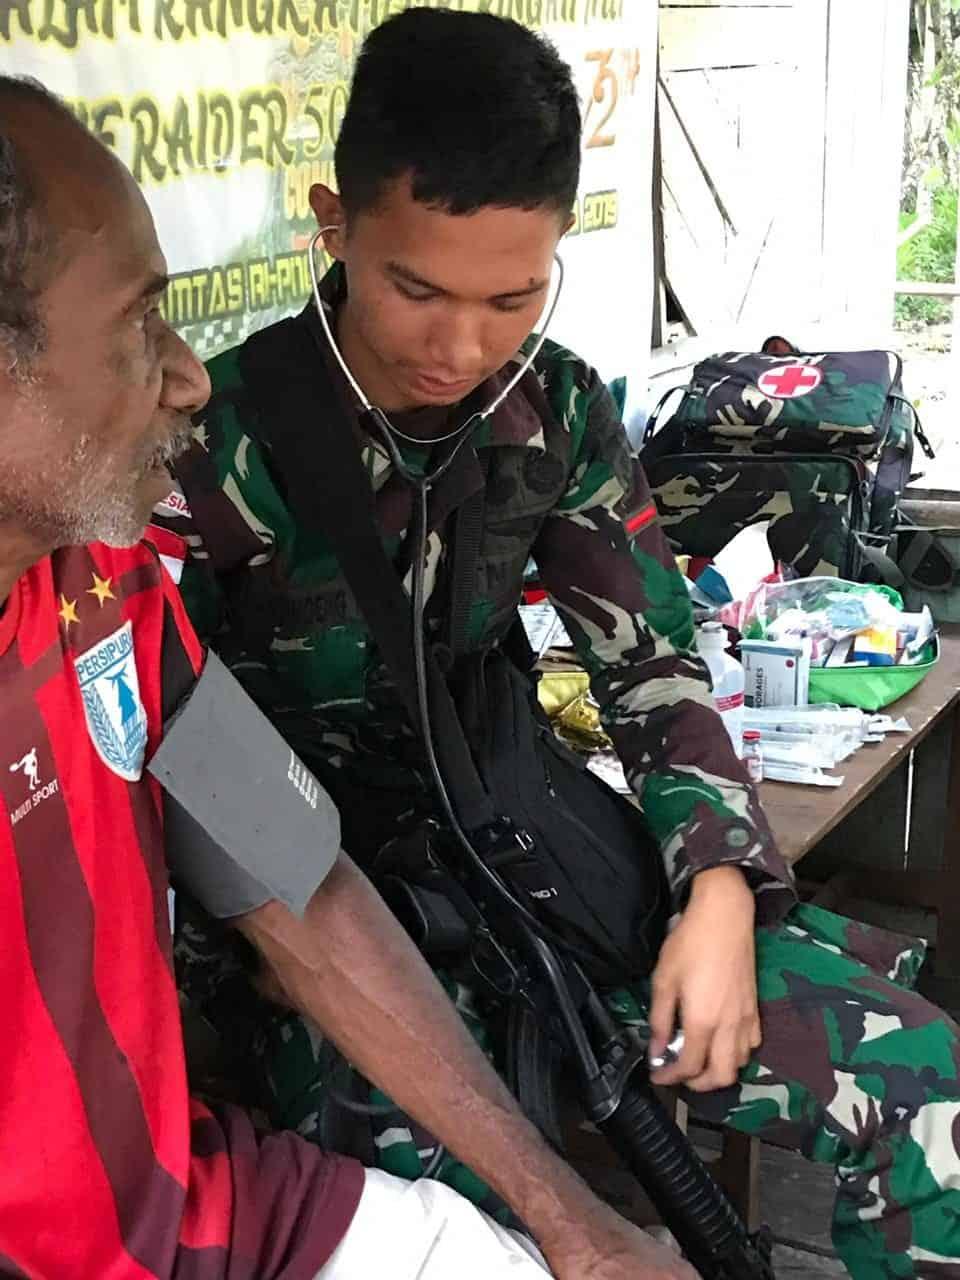 Pengobatan Door To Door Satgas Yonif R 509, Peduli Lansia di Papua